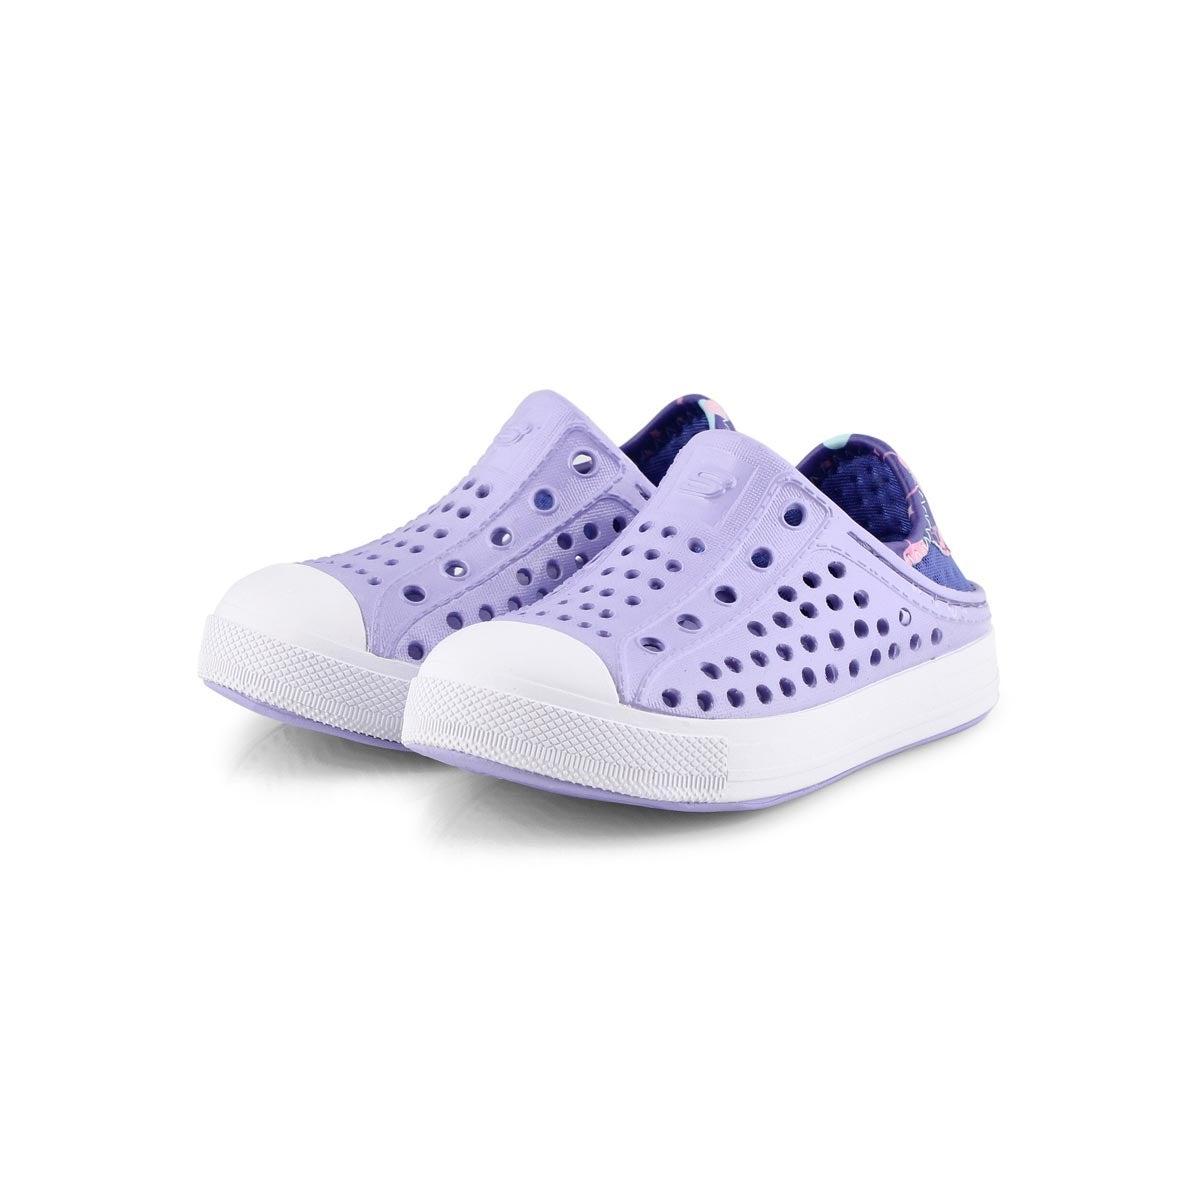 Infs-g Guzman Steps lvndr slip on shoe